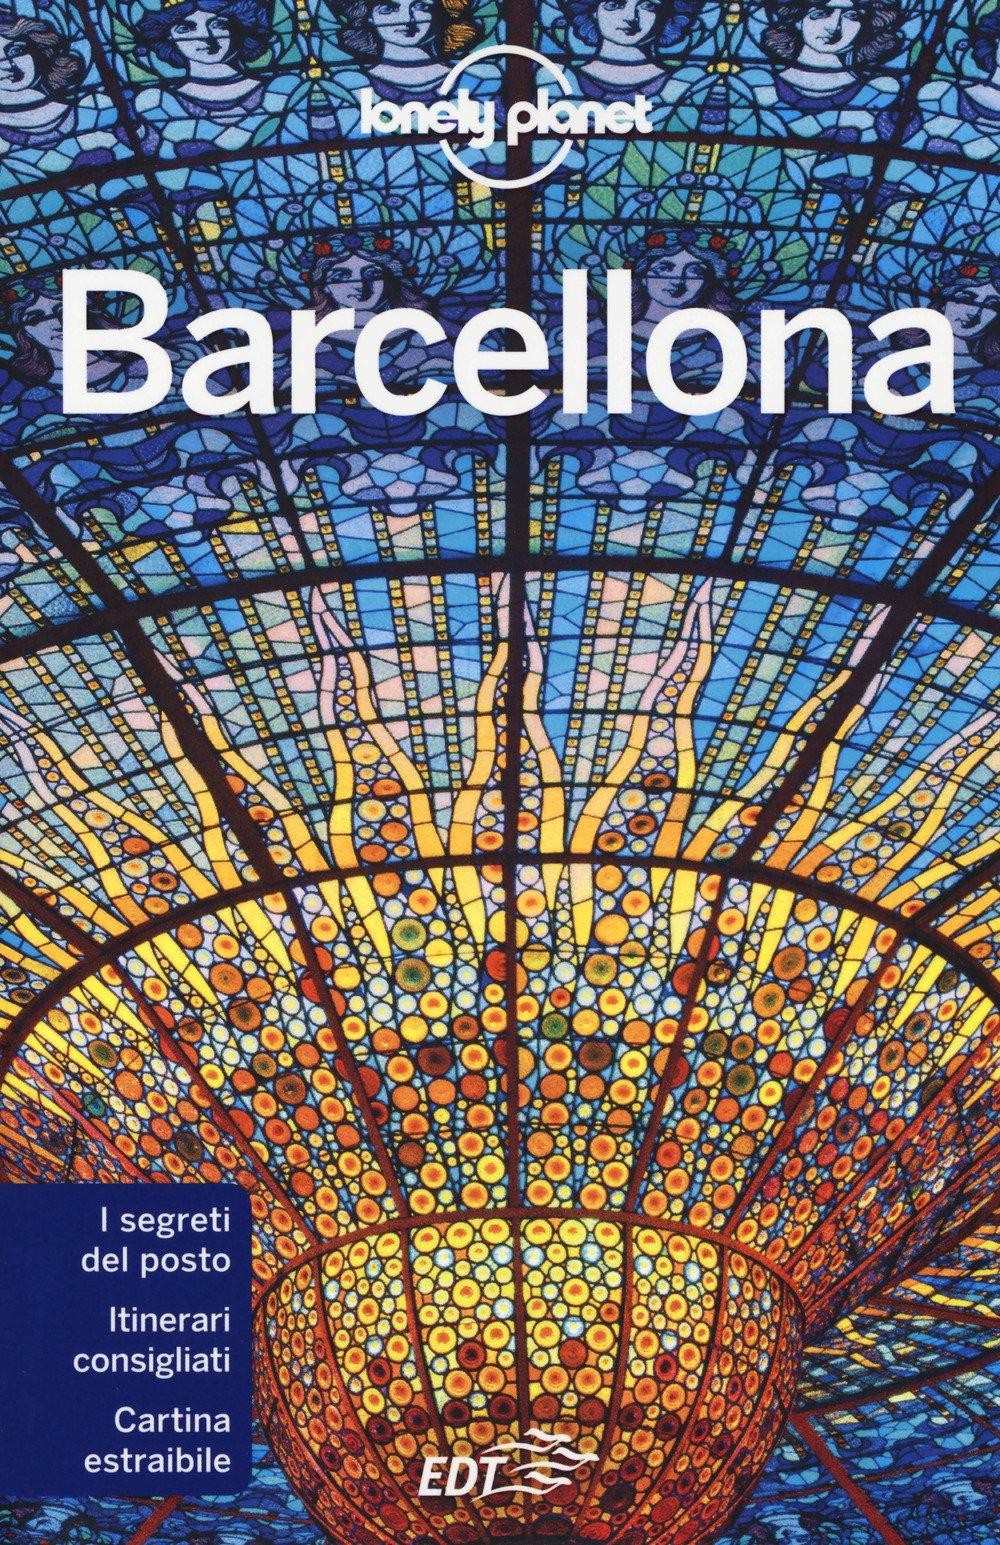 Barcellona Copertina flessibile – 18 mag 2017 Regis St. Louis Sally Davies C. Dapino P. Maschio